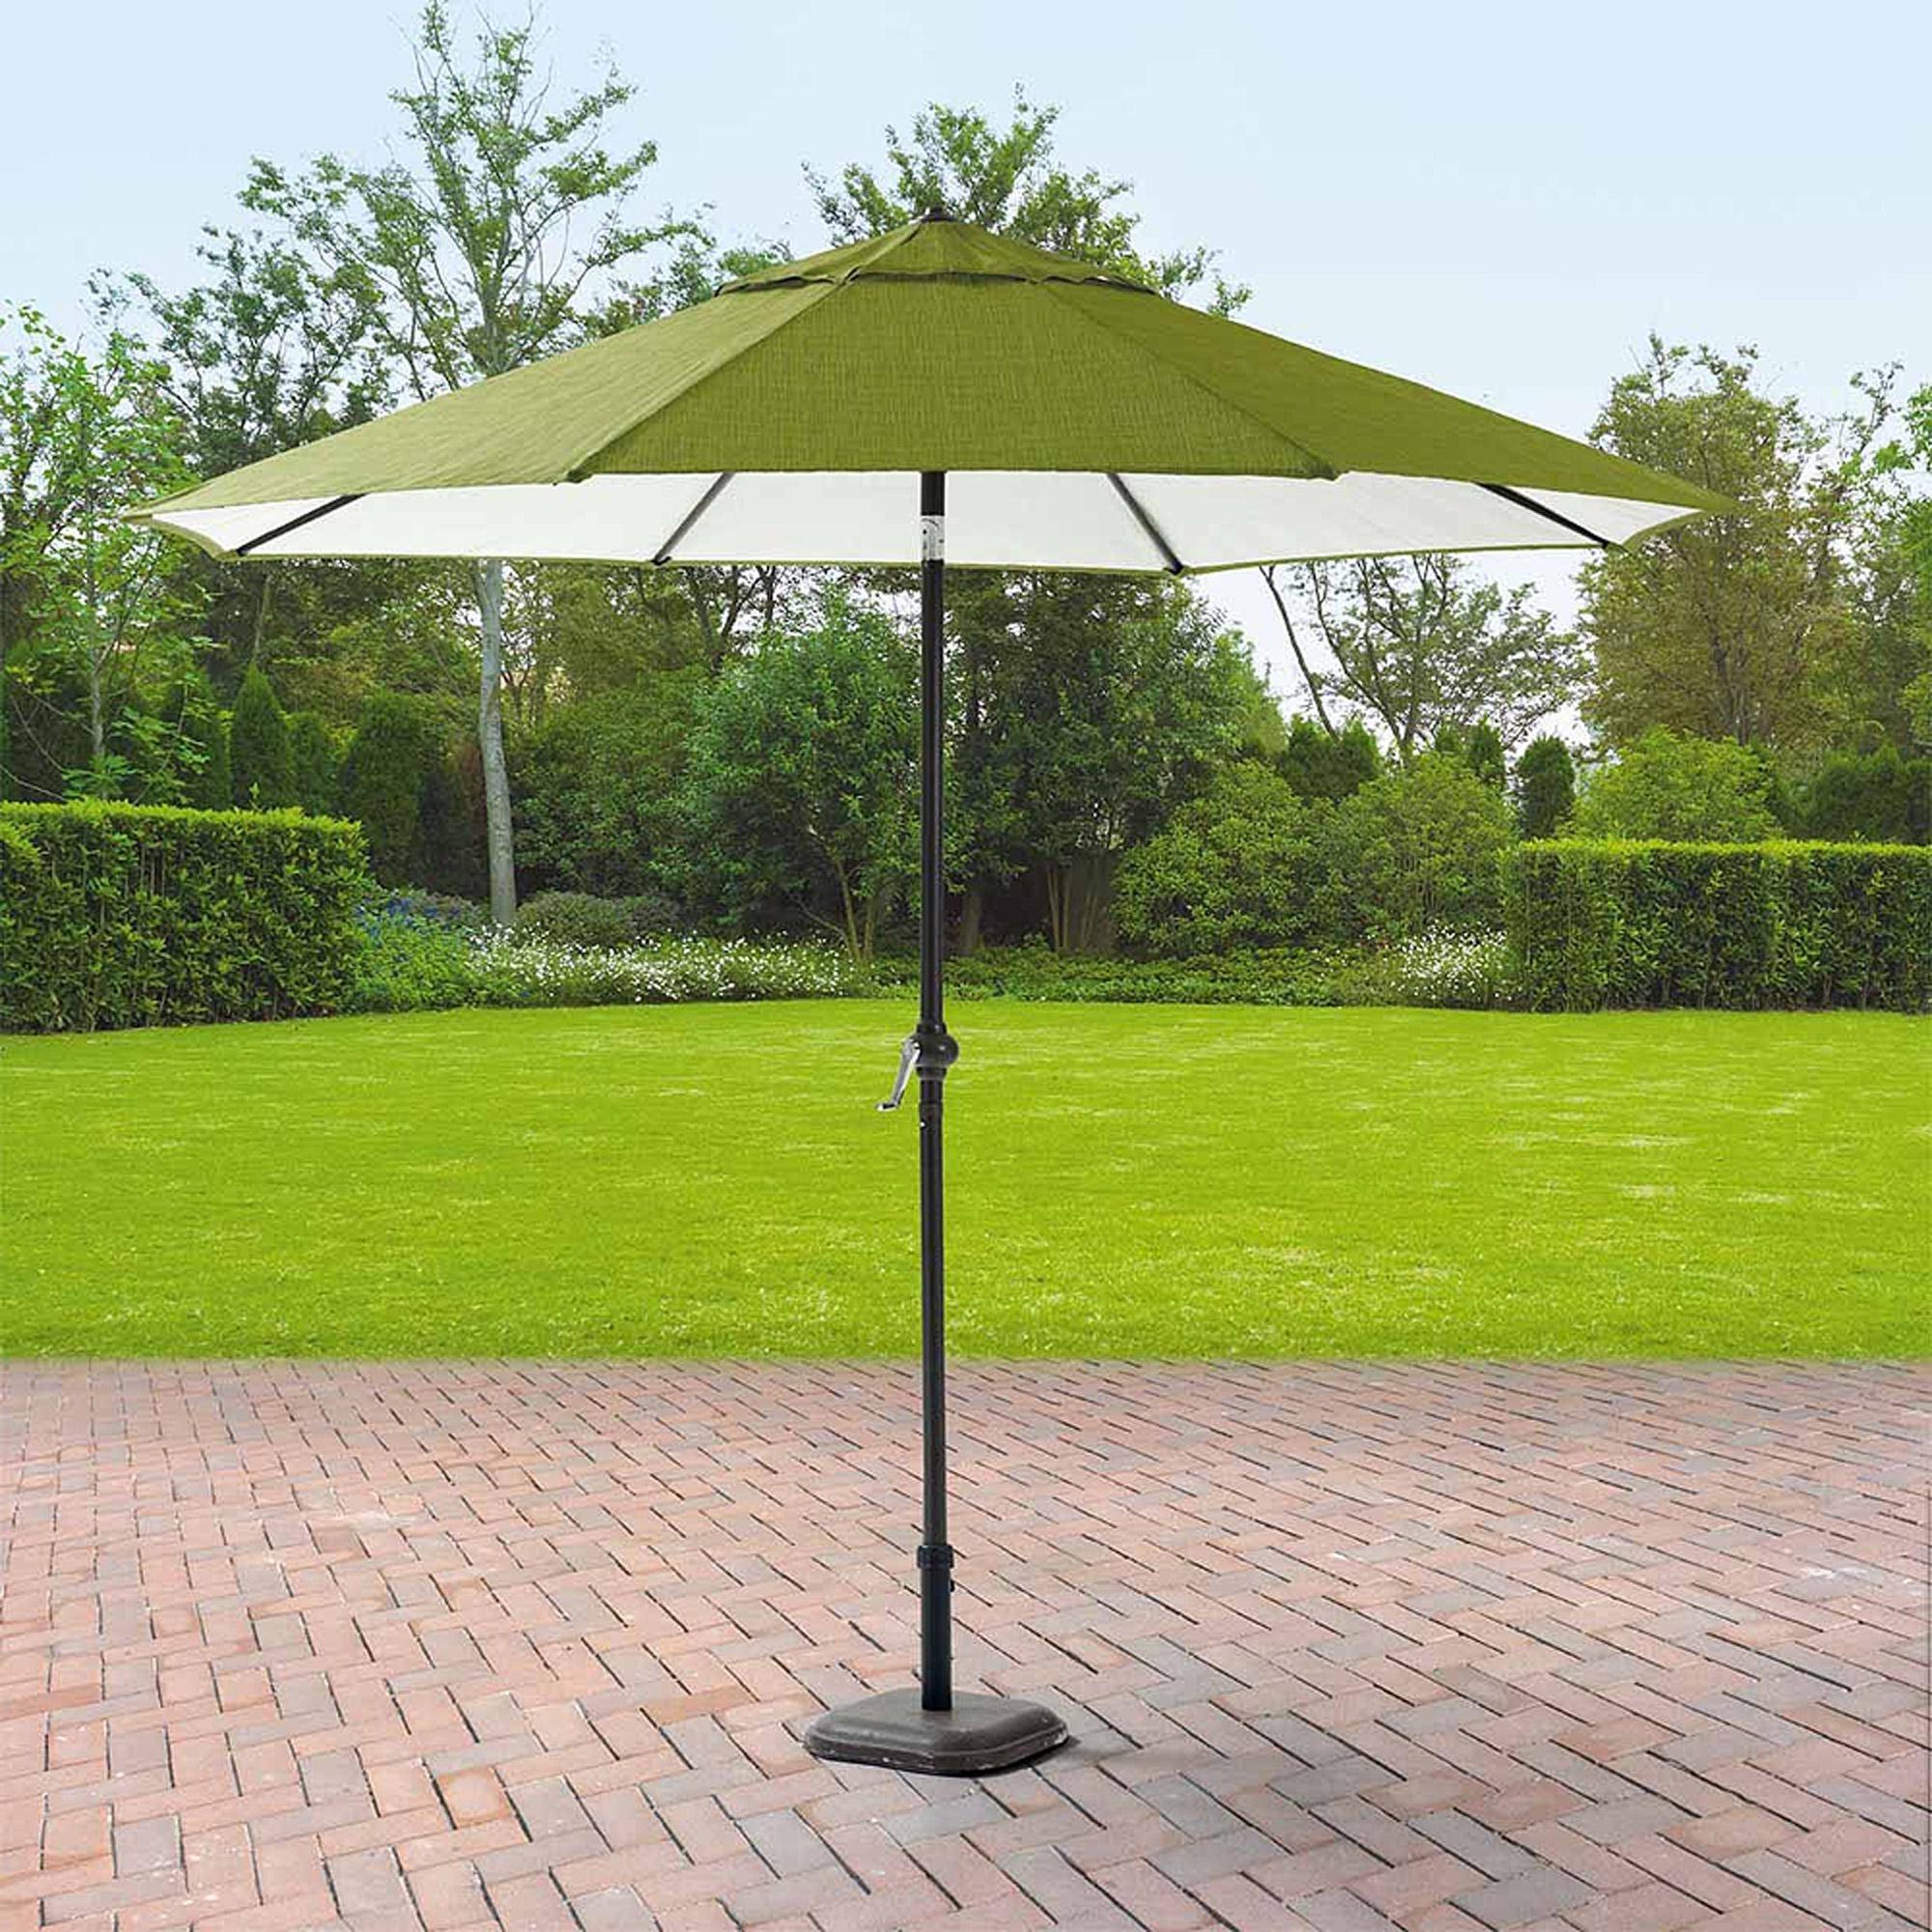 Patio Umbrellas Walmart – Home Design Ideas Regarding Current Sunbrella Patio Umbrellas At Walmart (View 4 of 20)